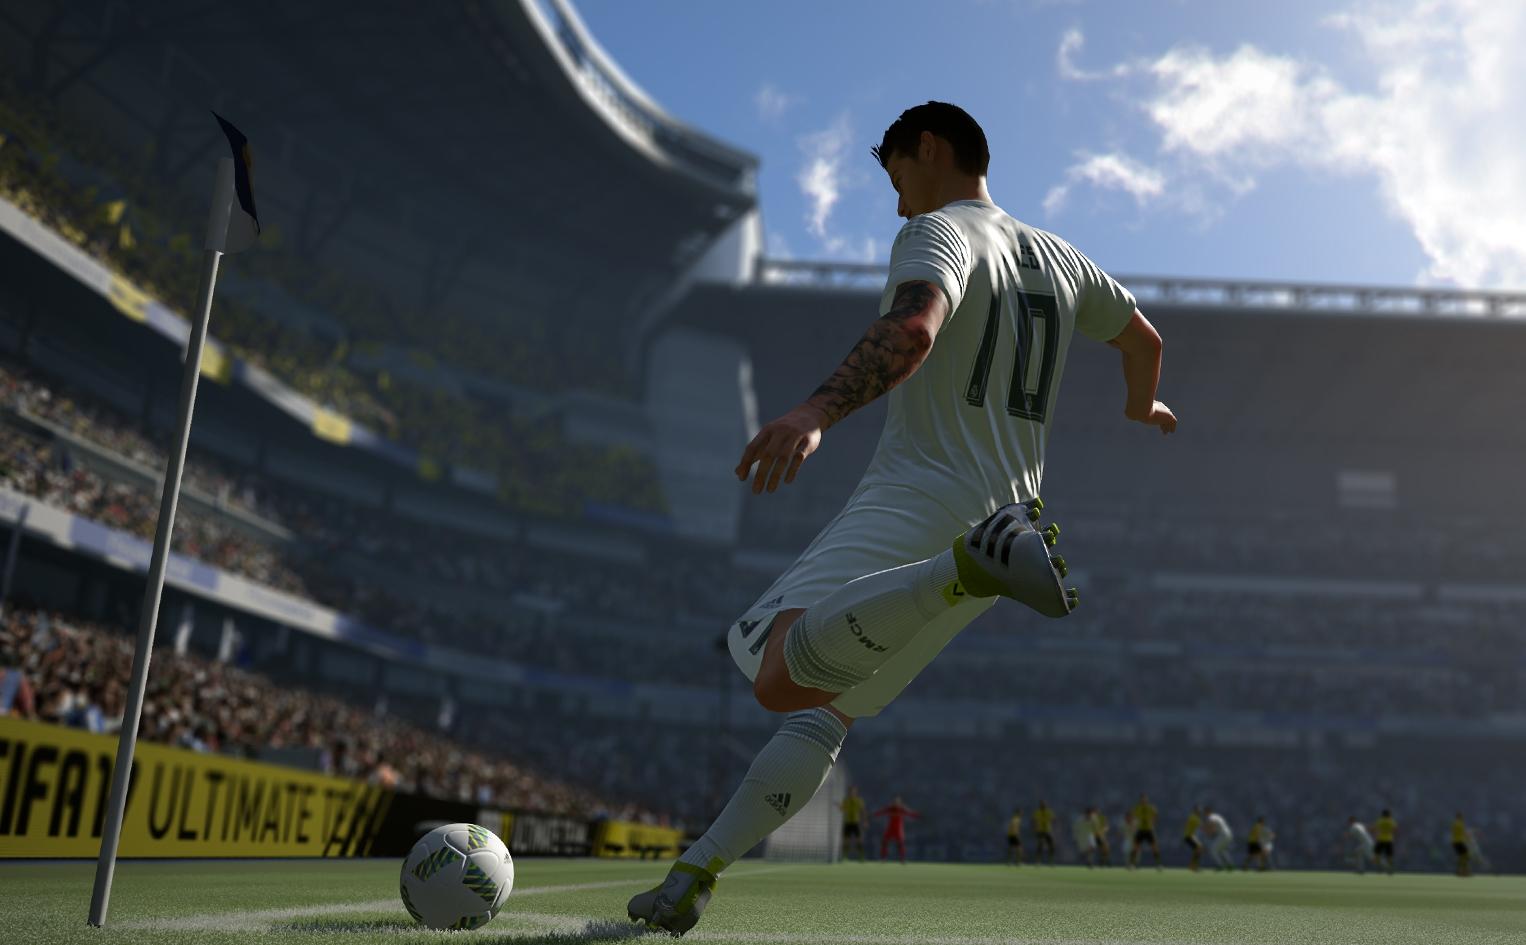 FIFA17_XB1_PS4_EAPLAY_JAMES_CORNER_WM_(1).jpg